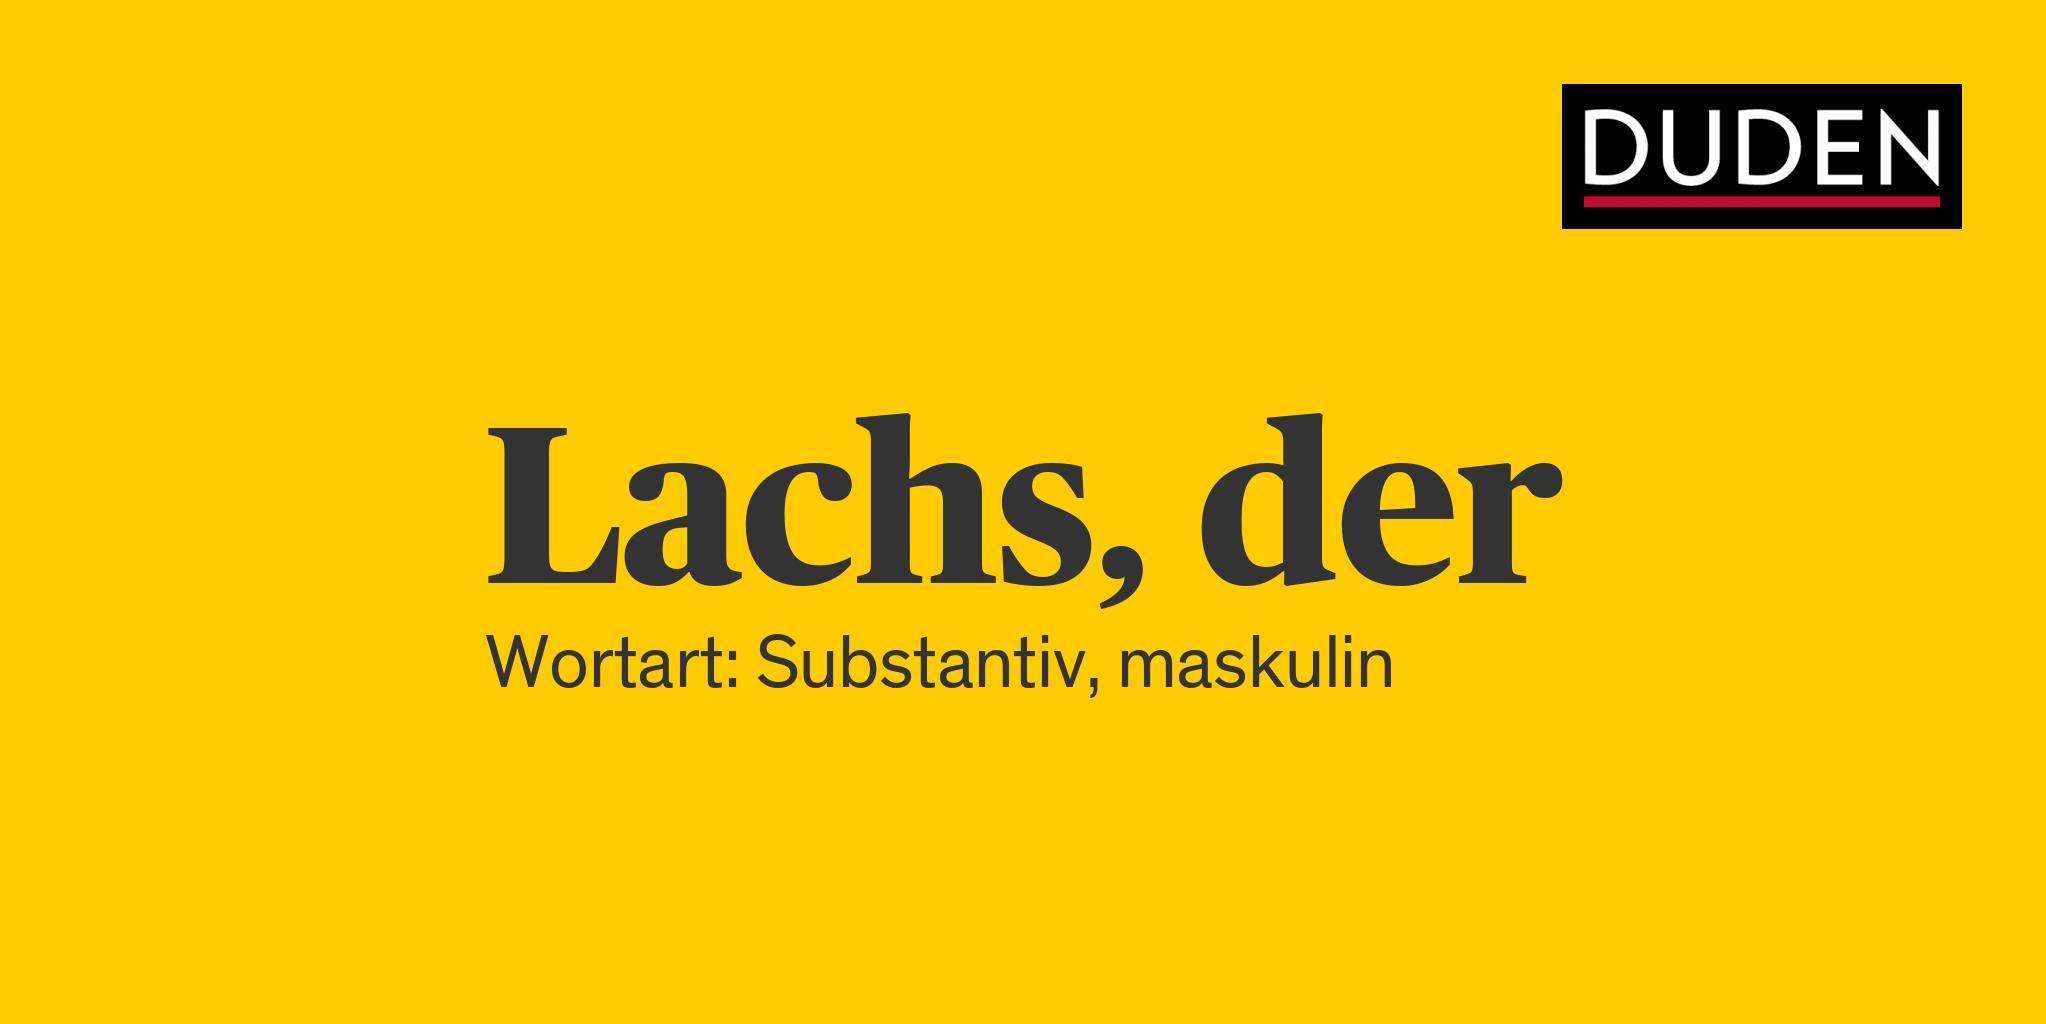 Lachs Duden